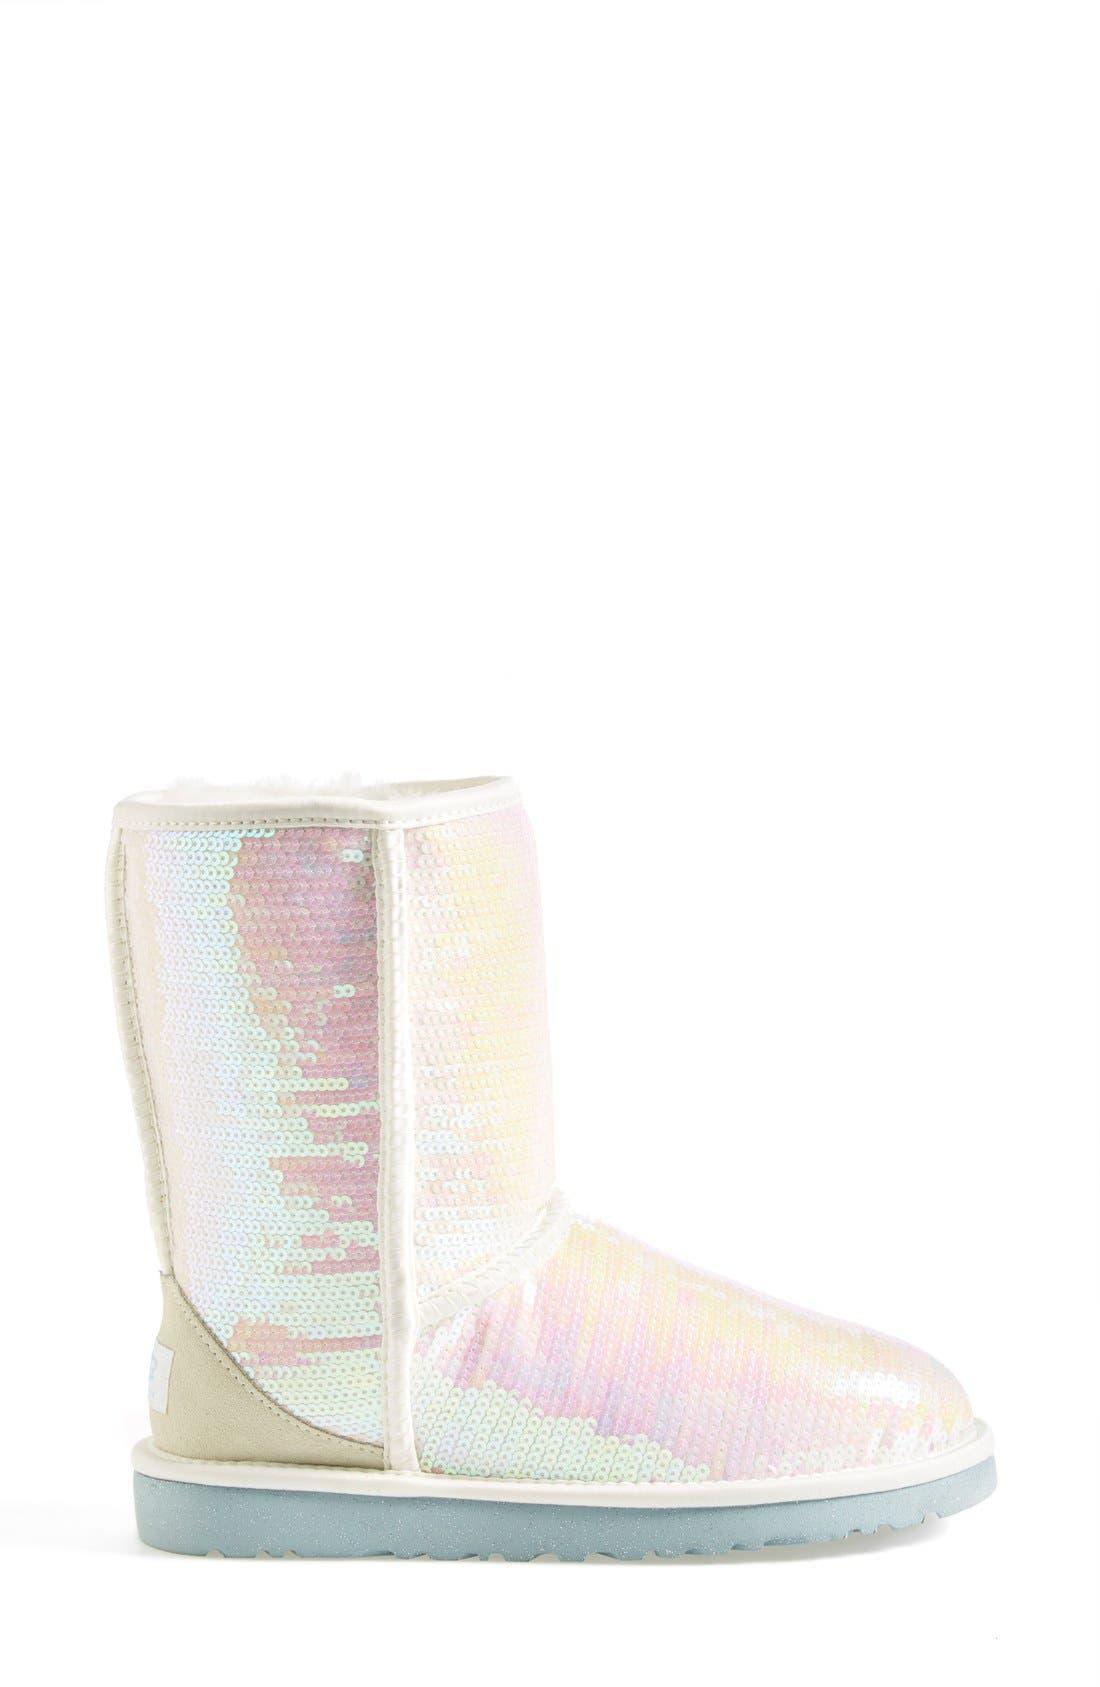 Australia 'Classic Short Sparkles - I Do' Boot,                             Alternate thumbnail 4, color,                             100